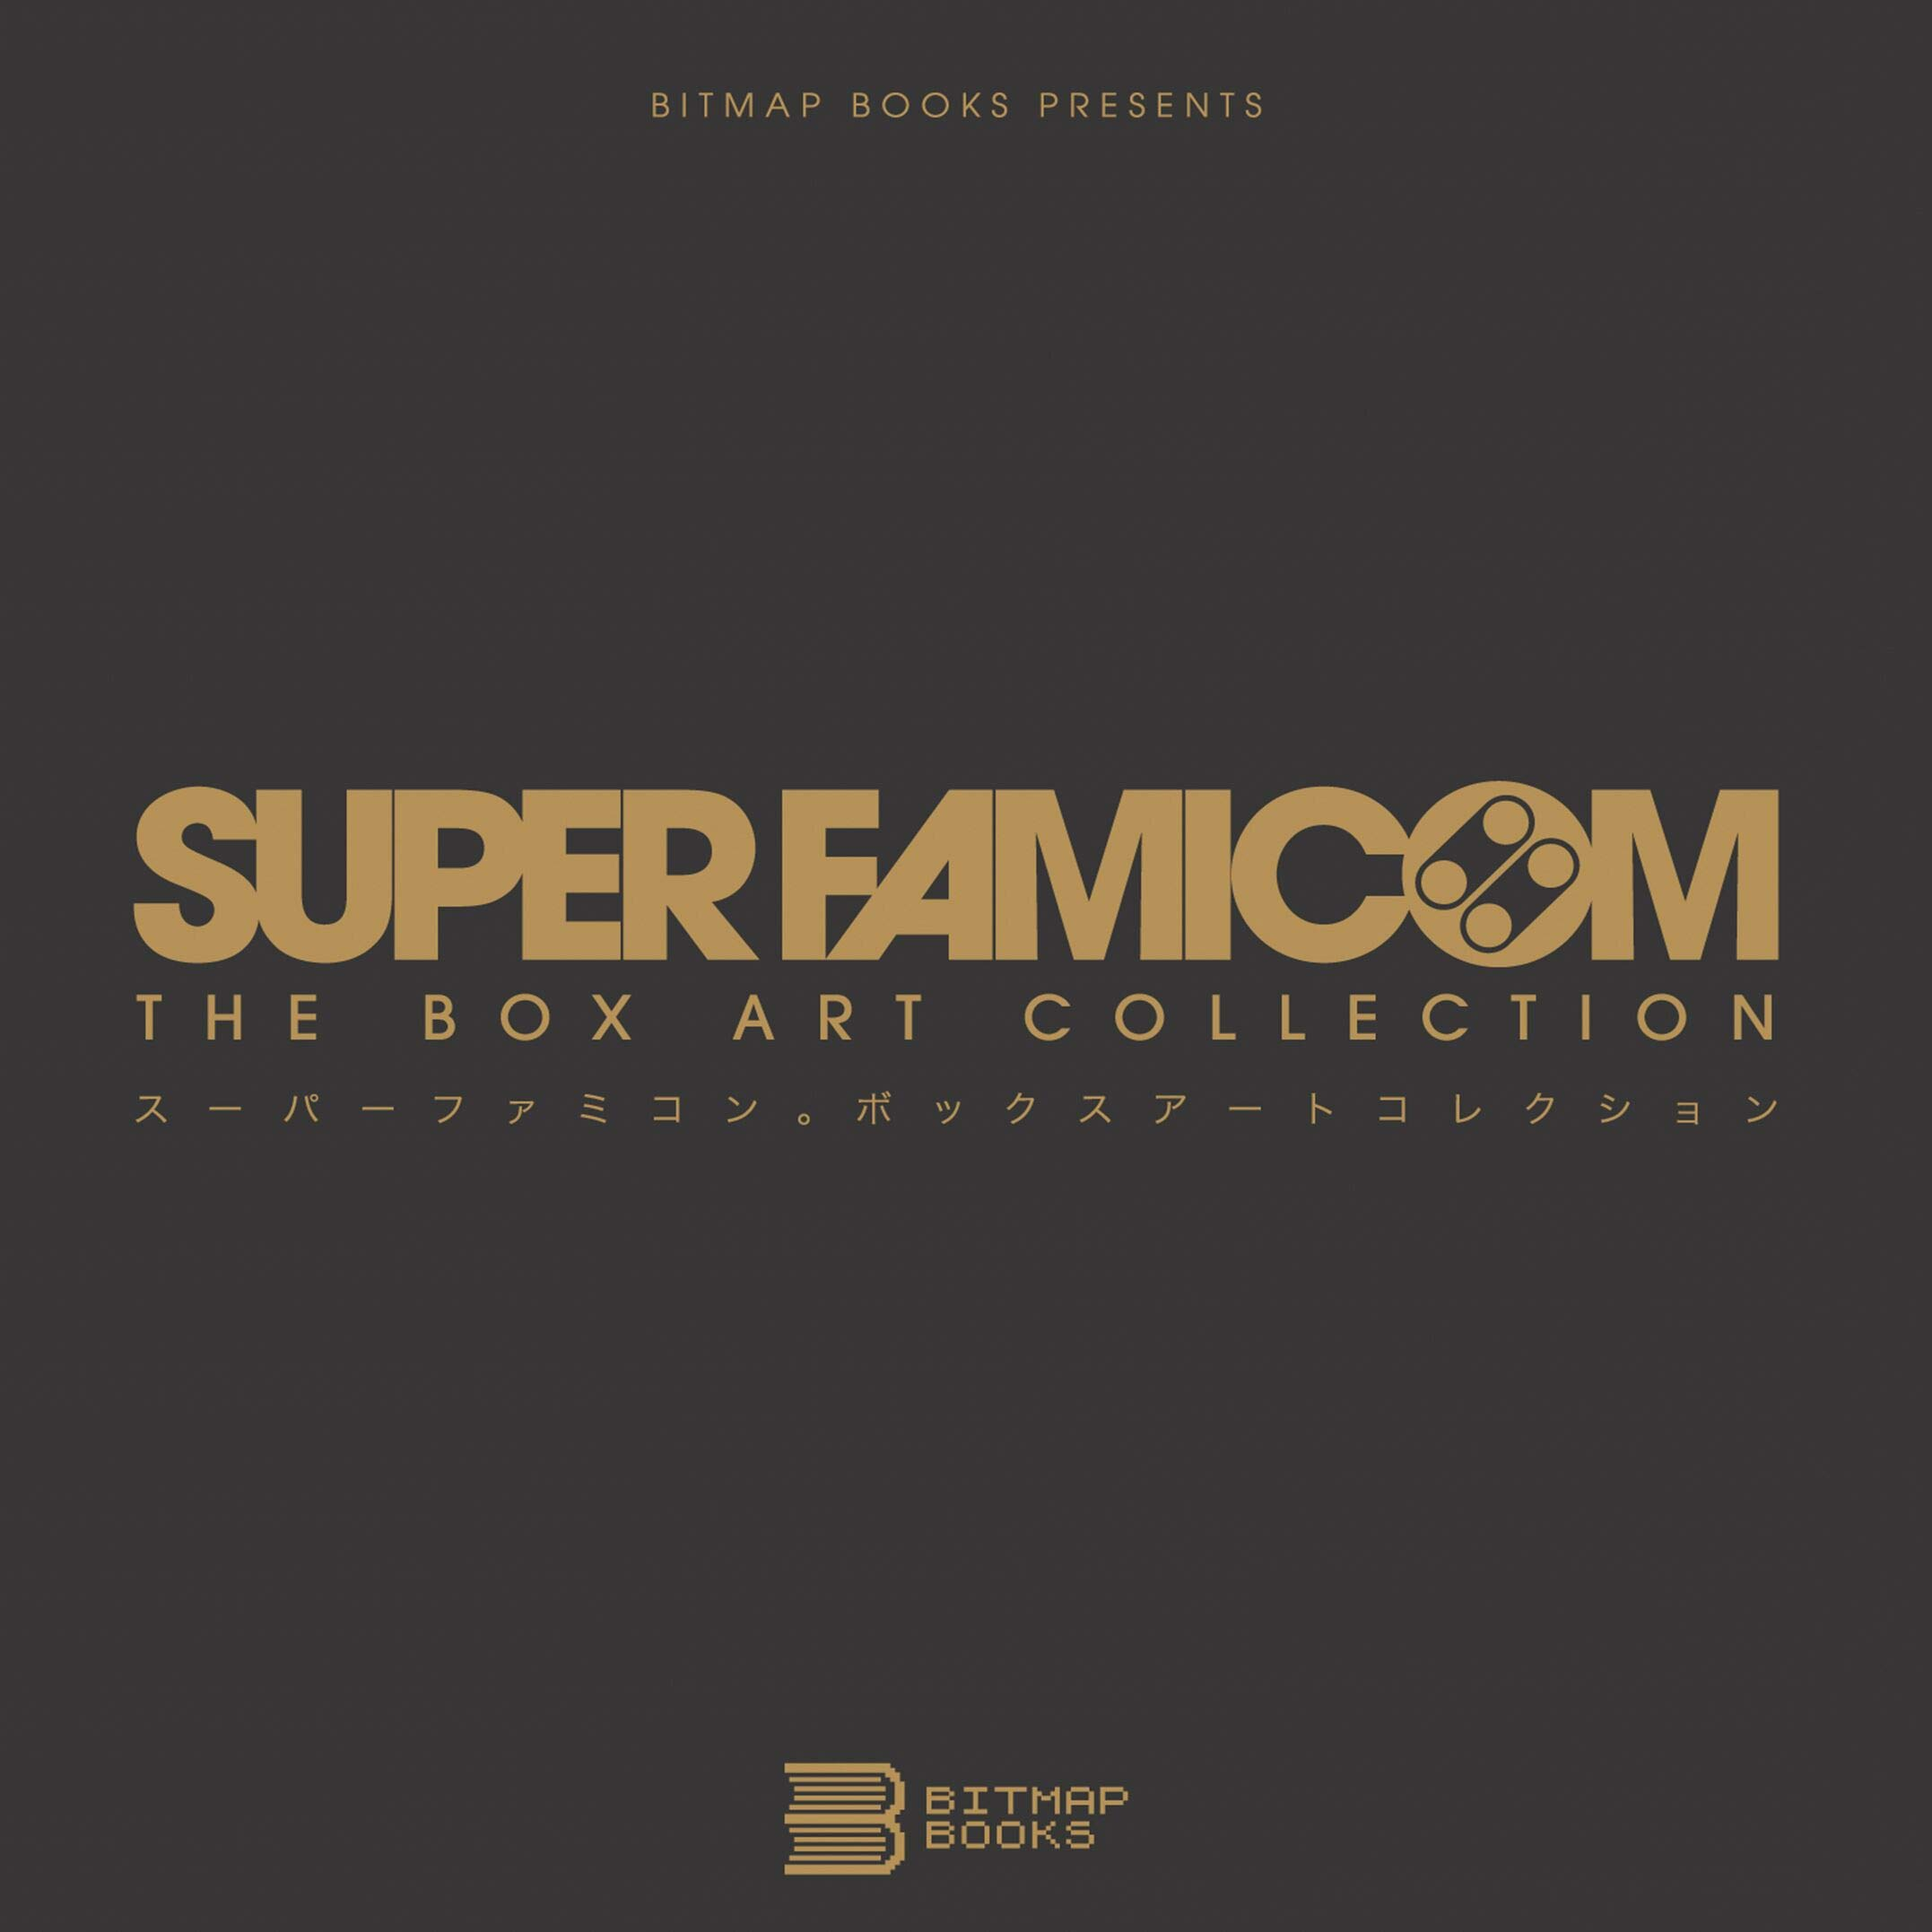 Super Famicom: The Box Art Collection: Amazon.es: Bitmap ...